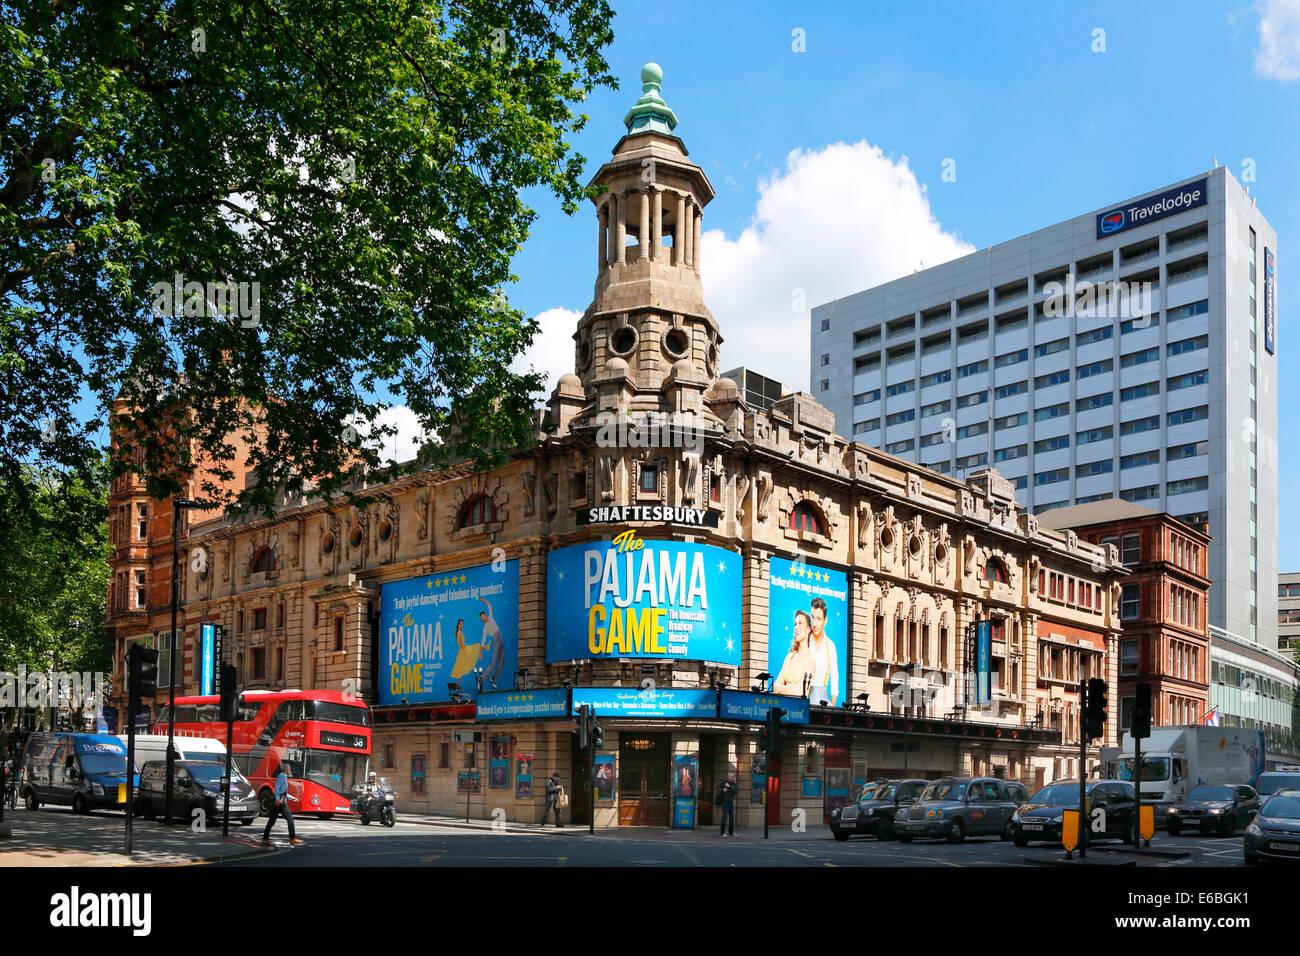 Großbritannien Great Britain London Shaftesbury Ave - Stock Image